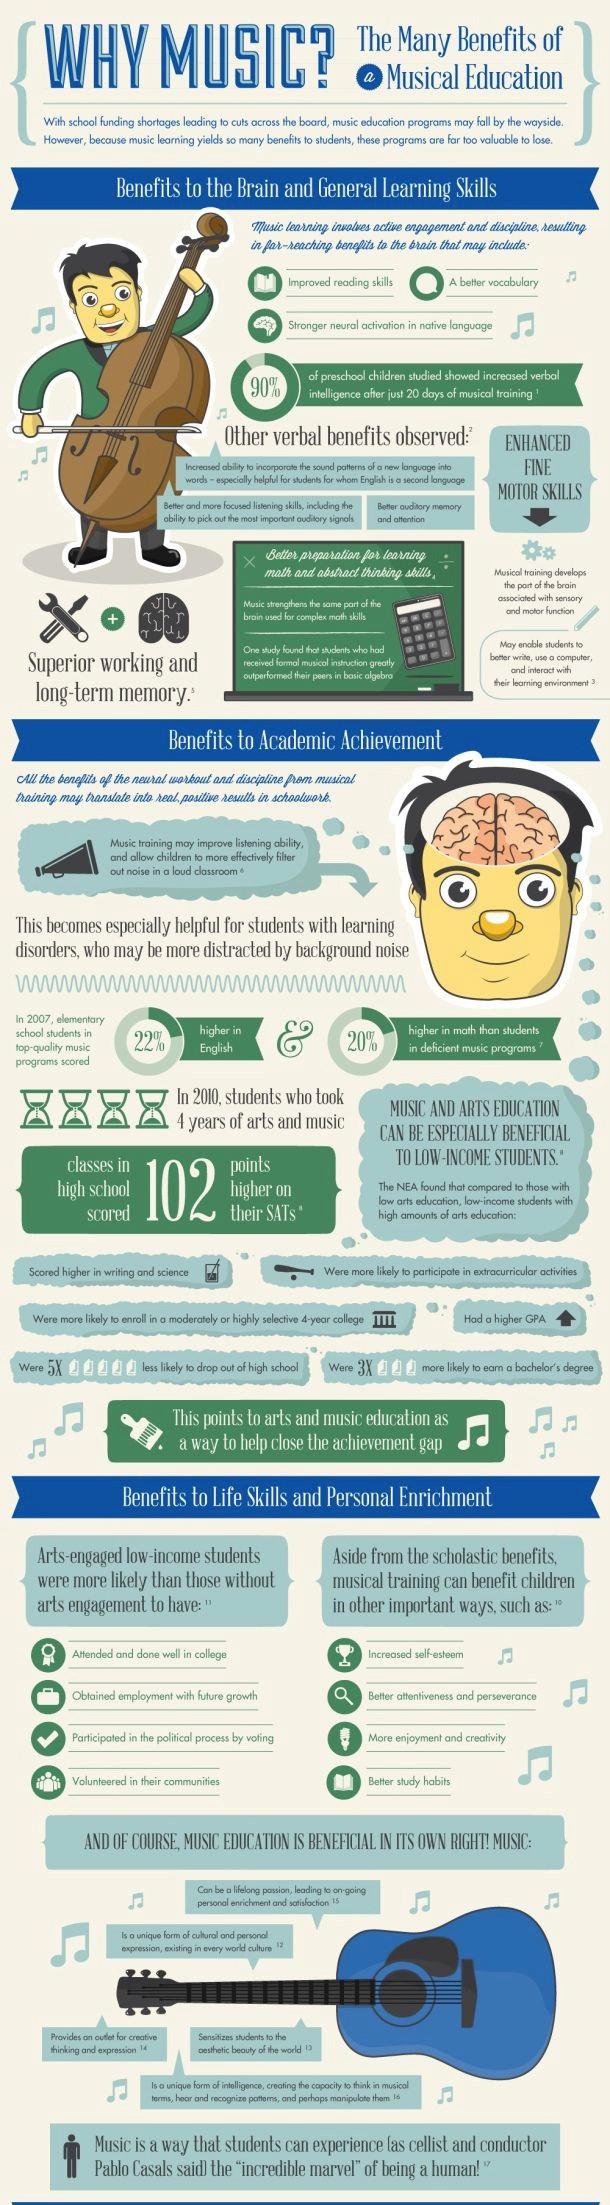 The Benefits of Music Ed U of Florida.jpg